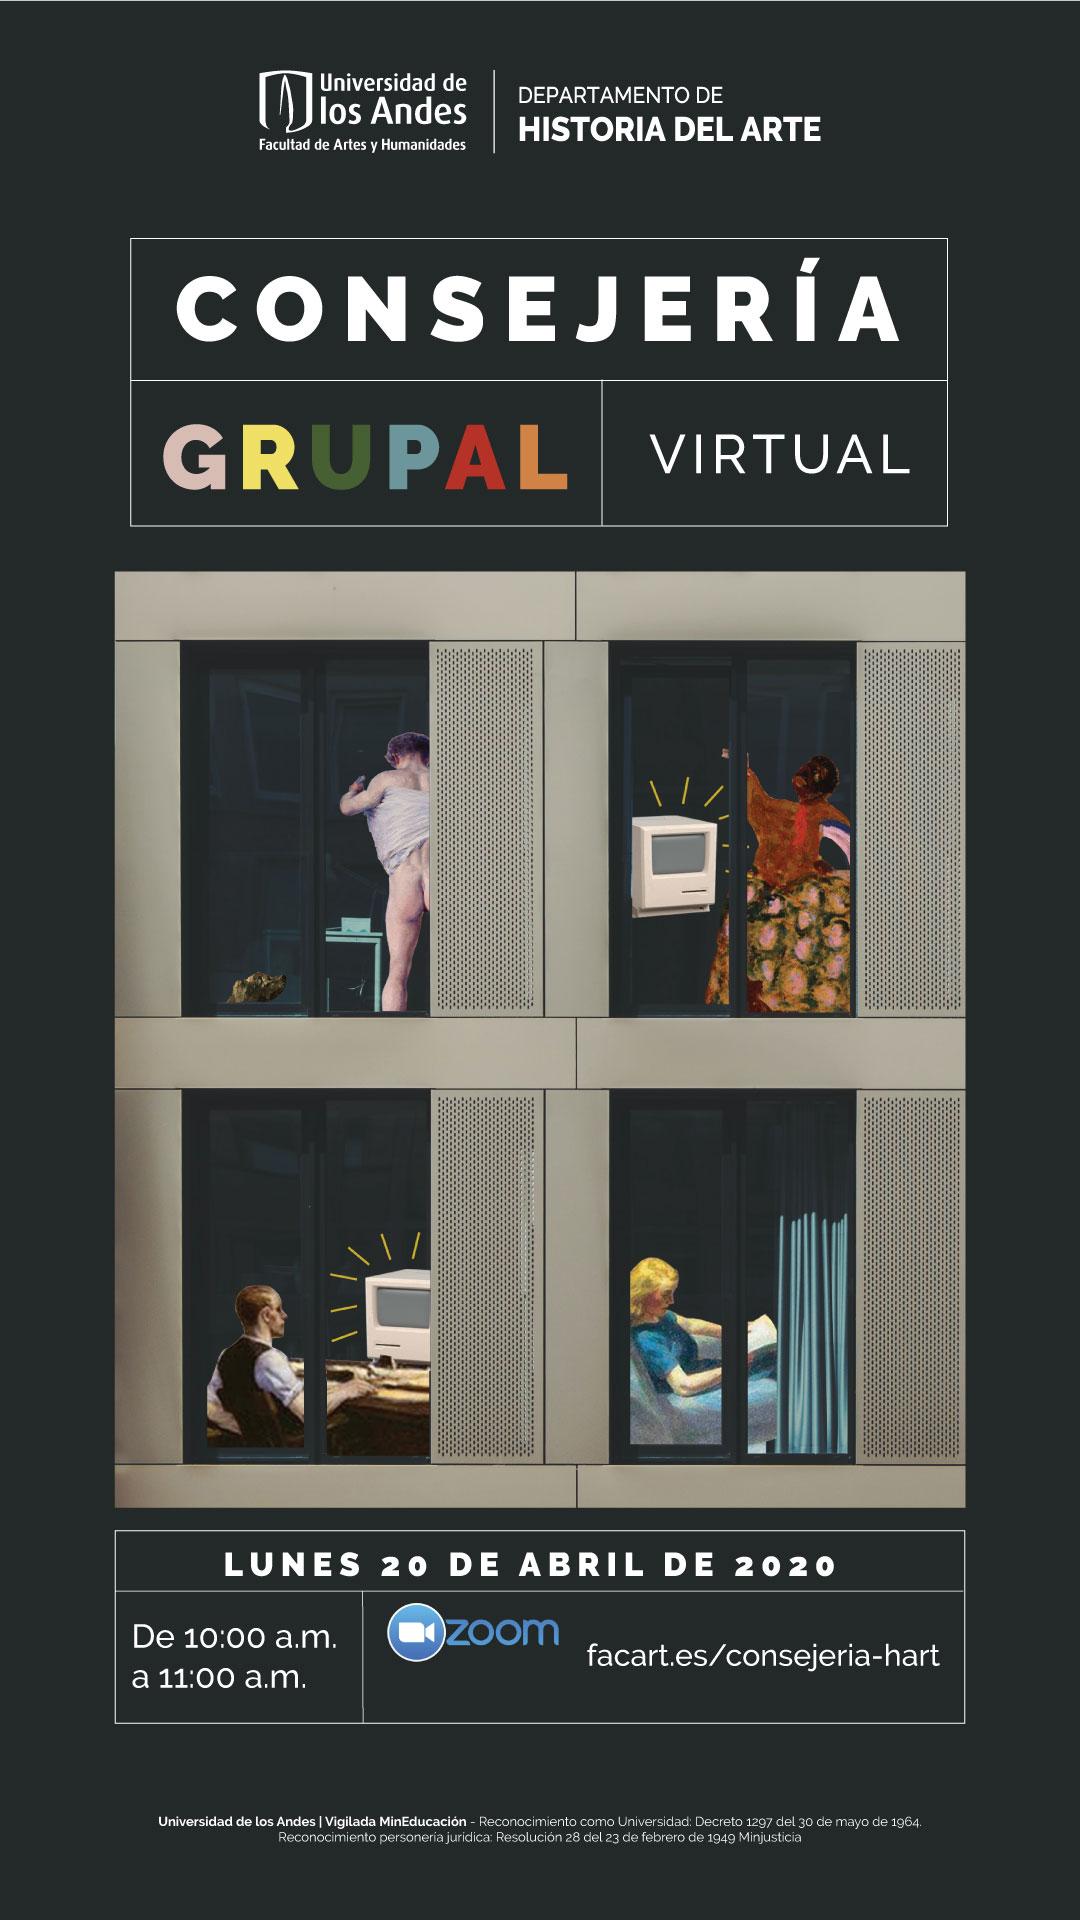 Consejería grupal virtual